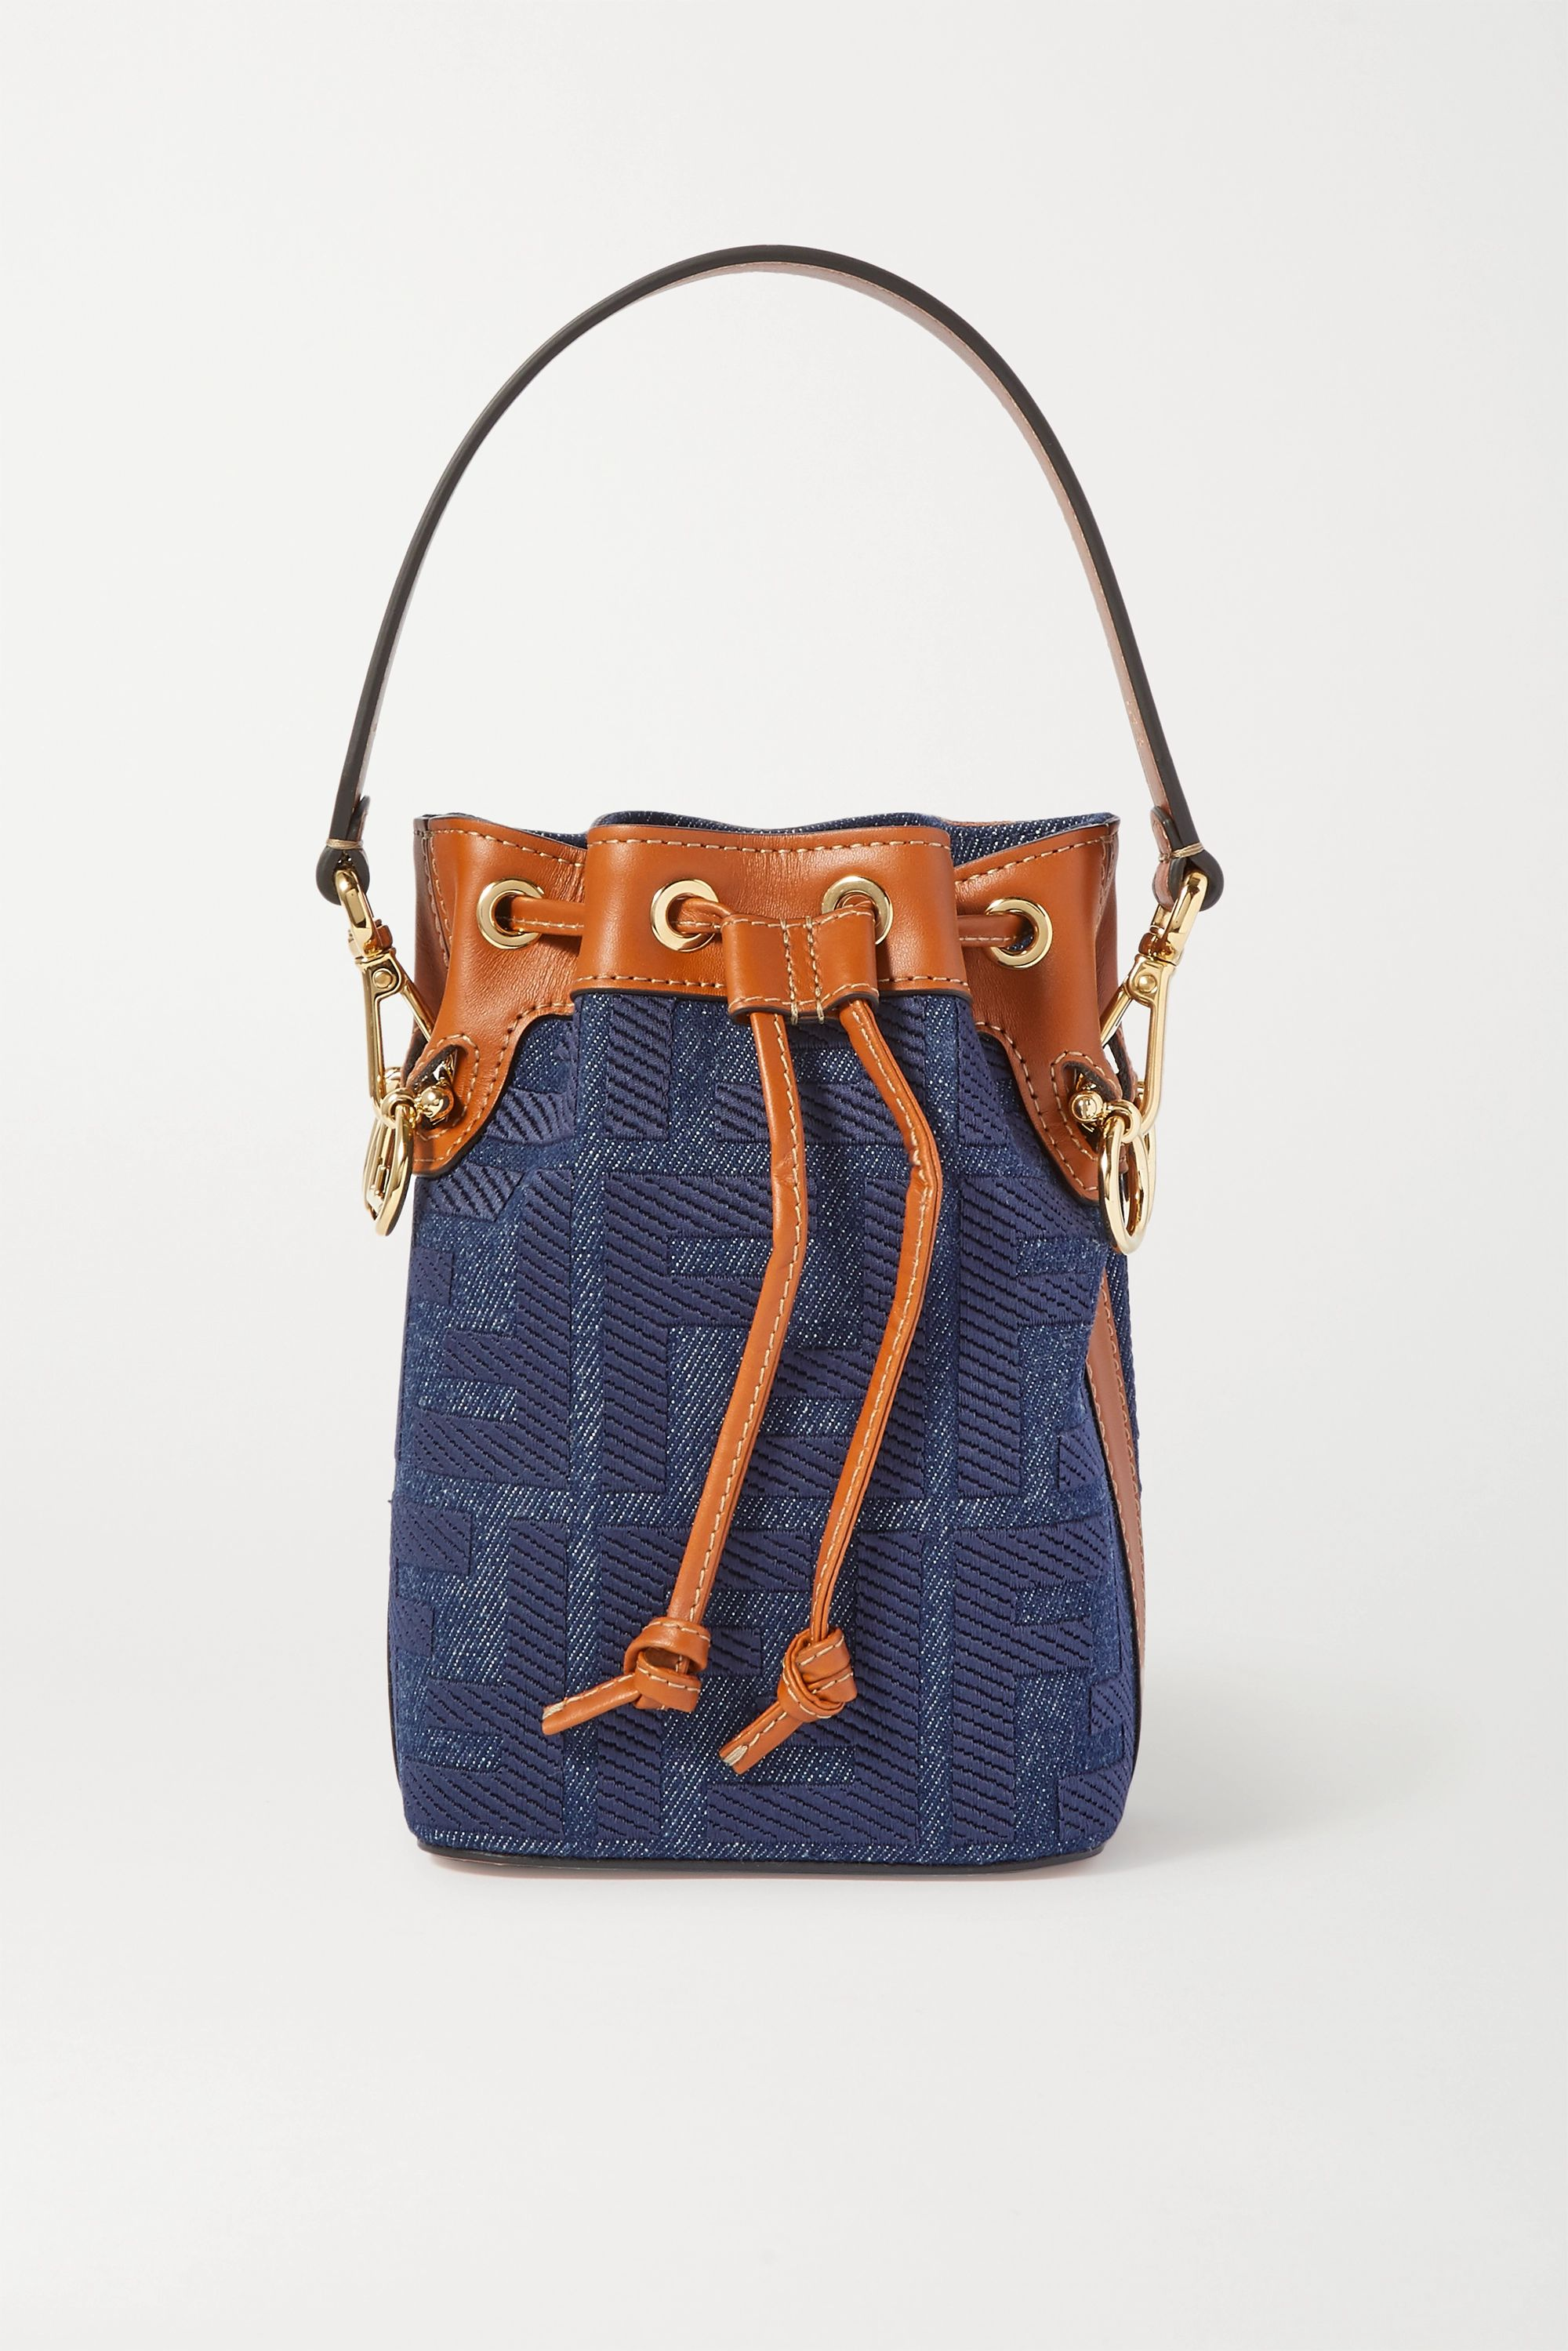 Fendi Mon Trésor mini leather-trimmed denim bucket bag